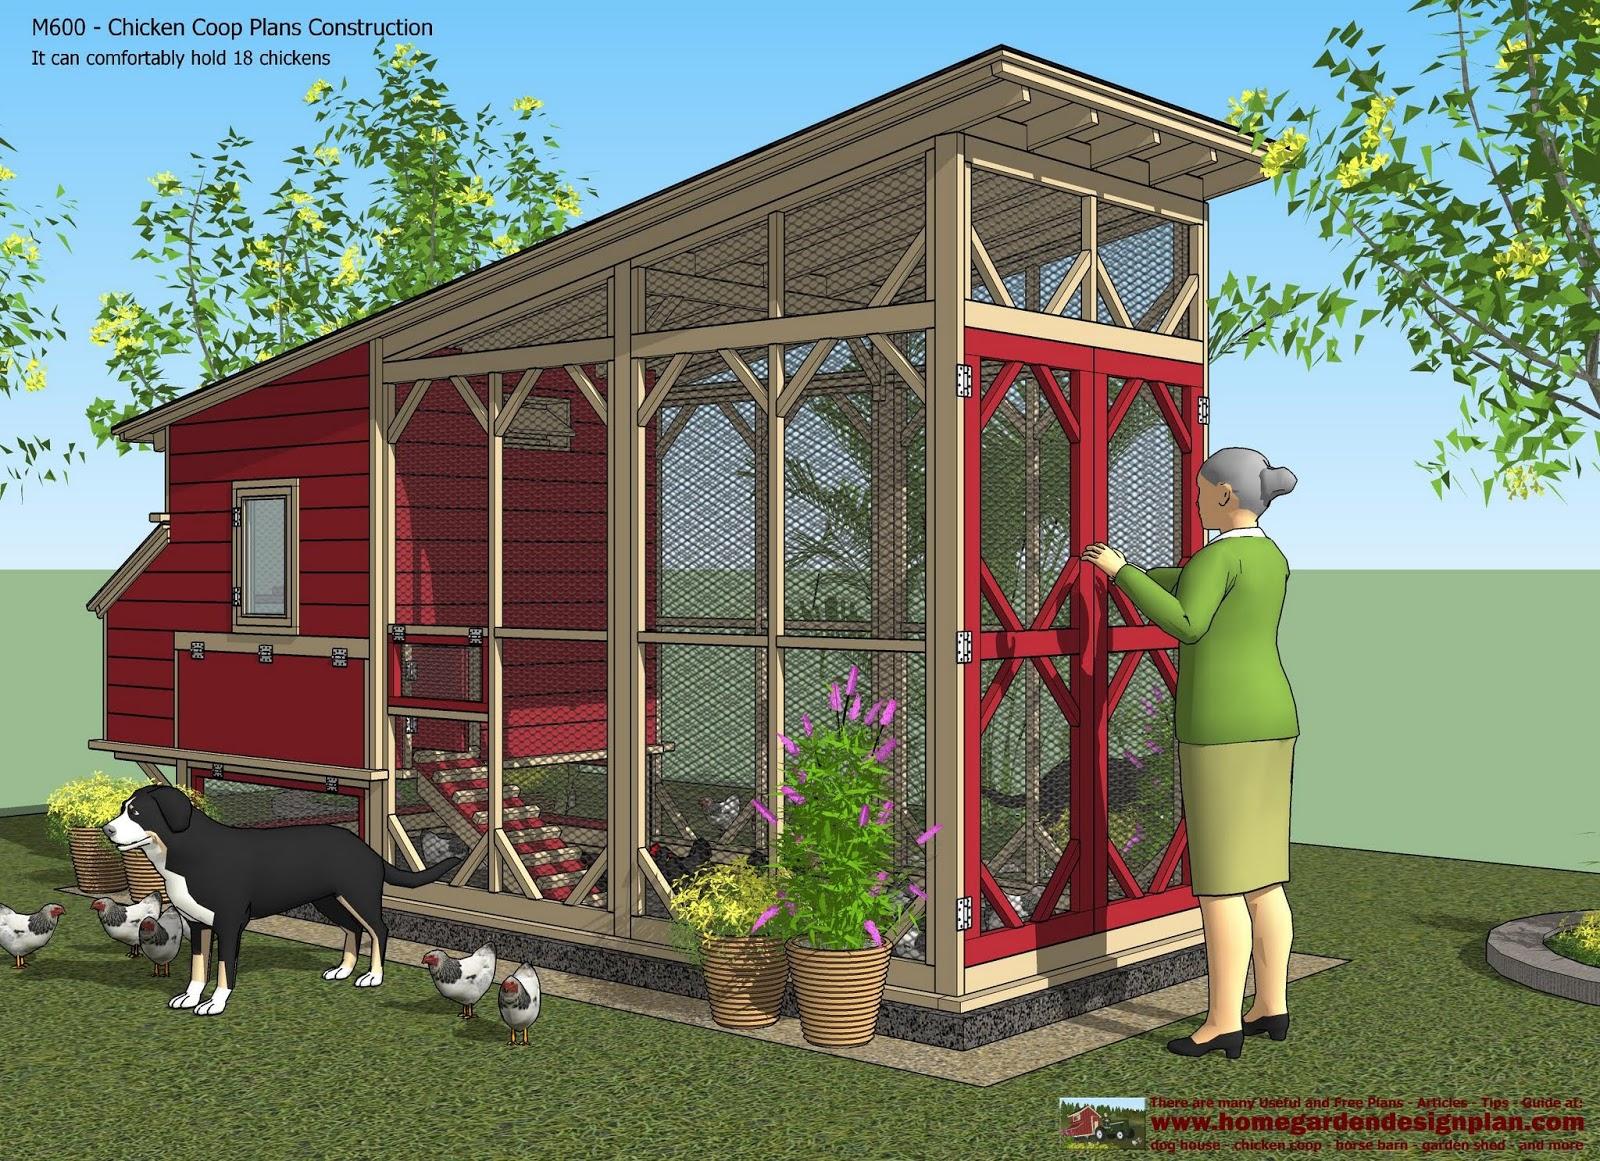 Home Garden Plans M600 Chicken Coop Plans Construction